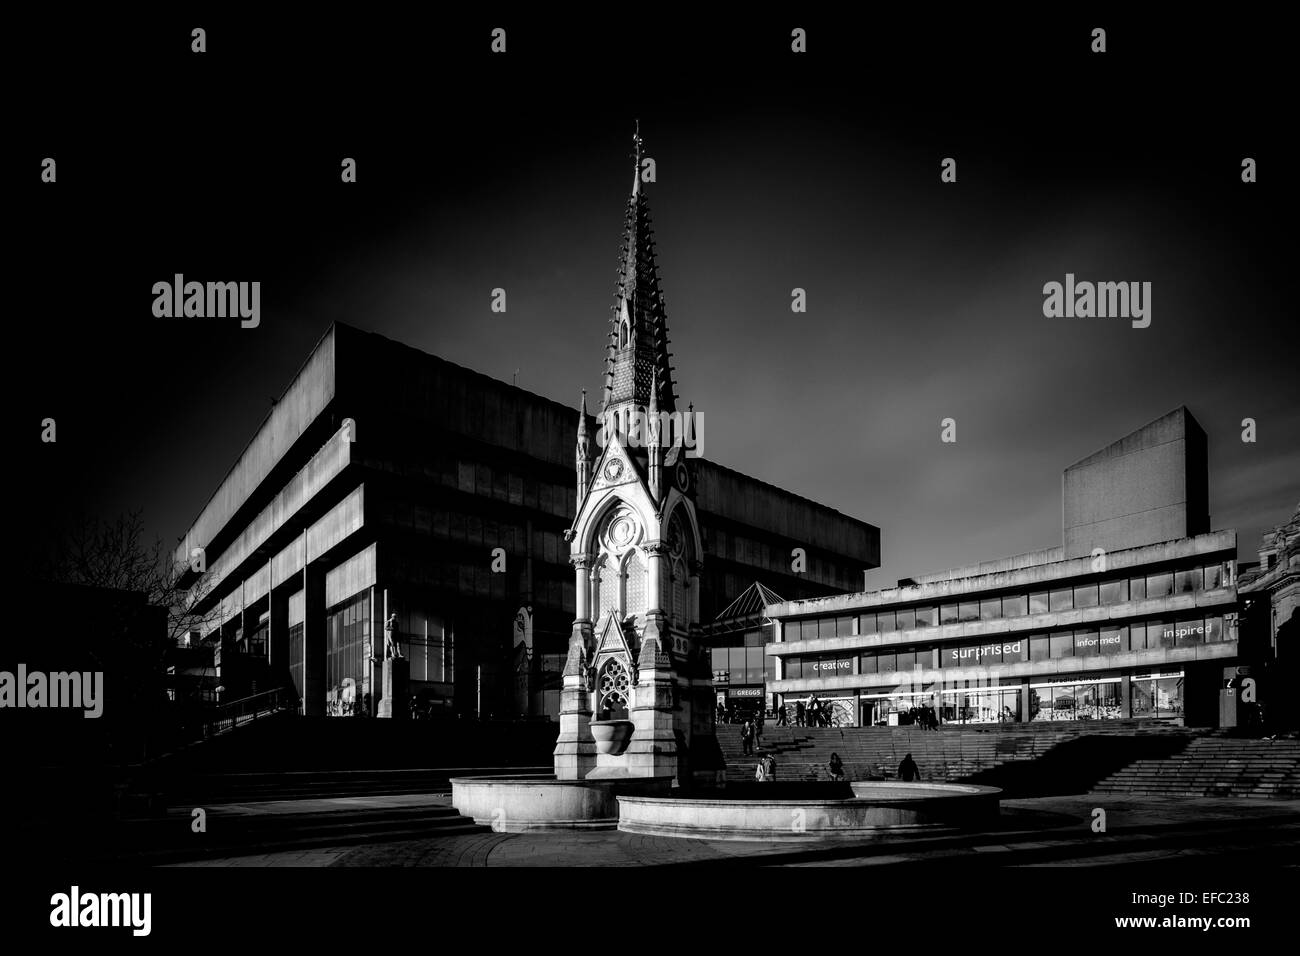 Die alte Bibliothek (vor dem Abriss) in Chamberlain Quadrat, Birmingham., Birmingham. Stockbild